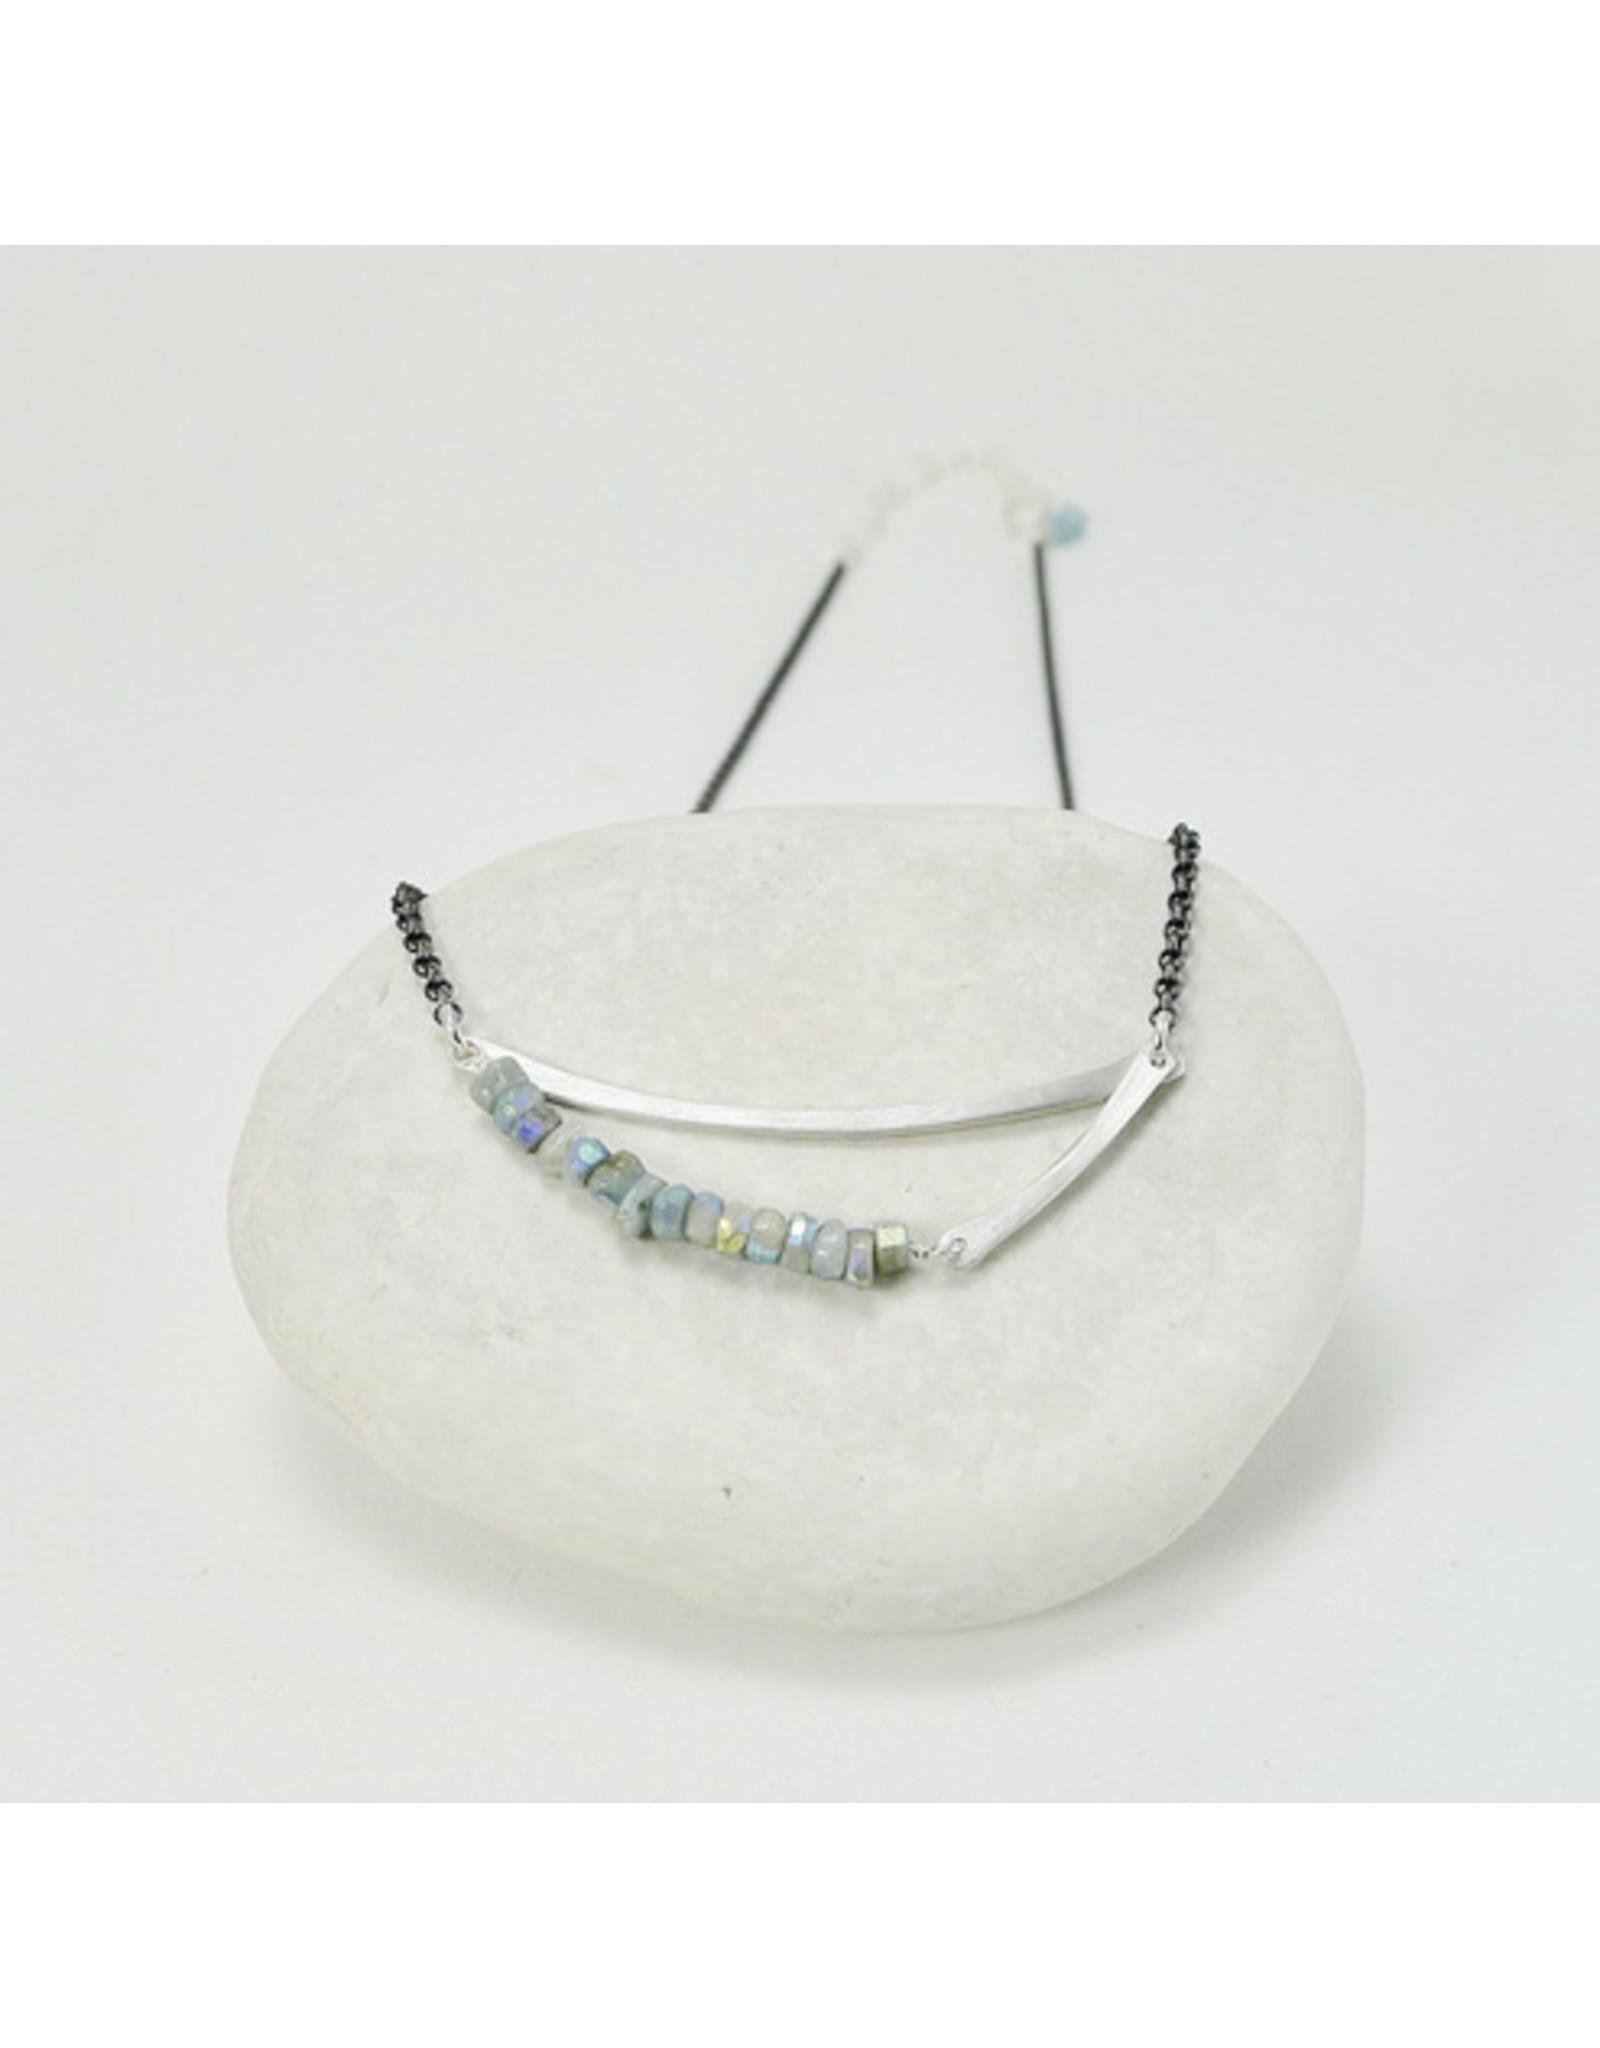 Bridget Clark - Consignment N1561 Sterling Stone Sling - Chrysocola